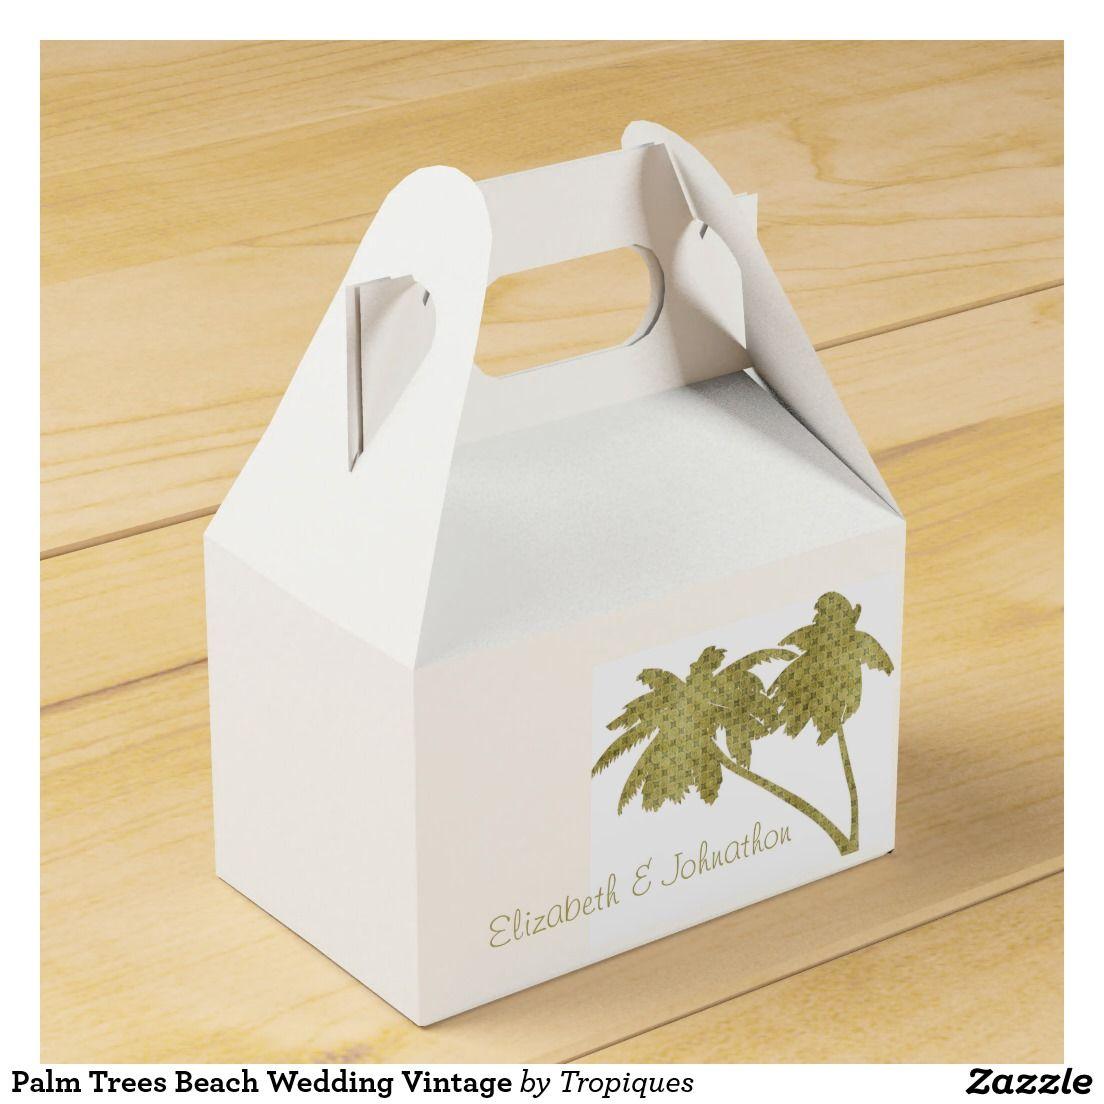 Palm Trees Beach Wedding Vintage Favor Box | Palm trees beach ...